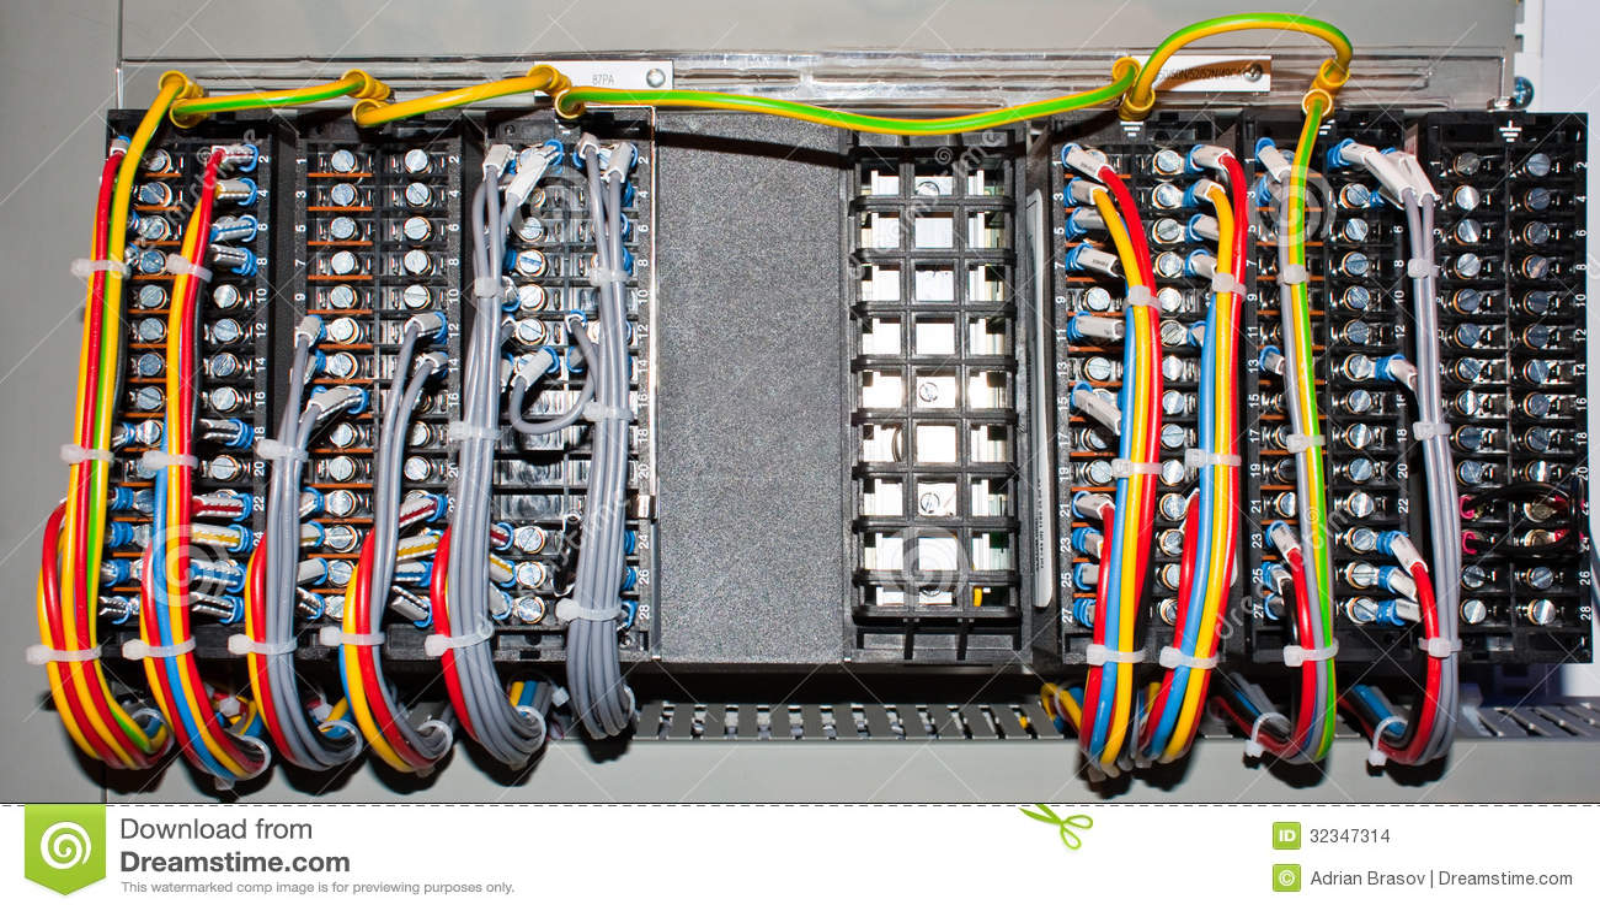 Großzügig 200 Amp Panel Drahtgröße Galerie - Elektrische Schaltplan ...